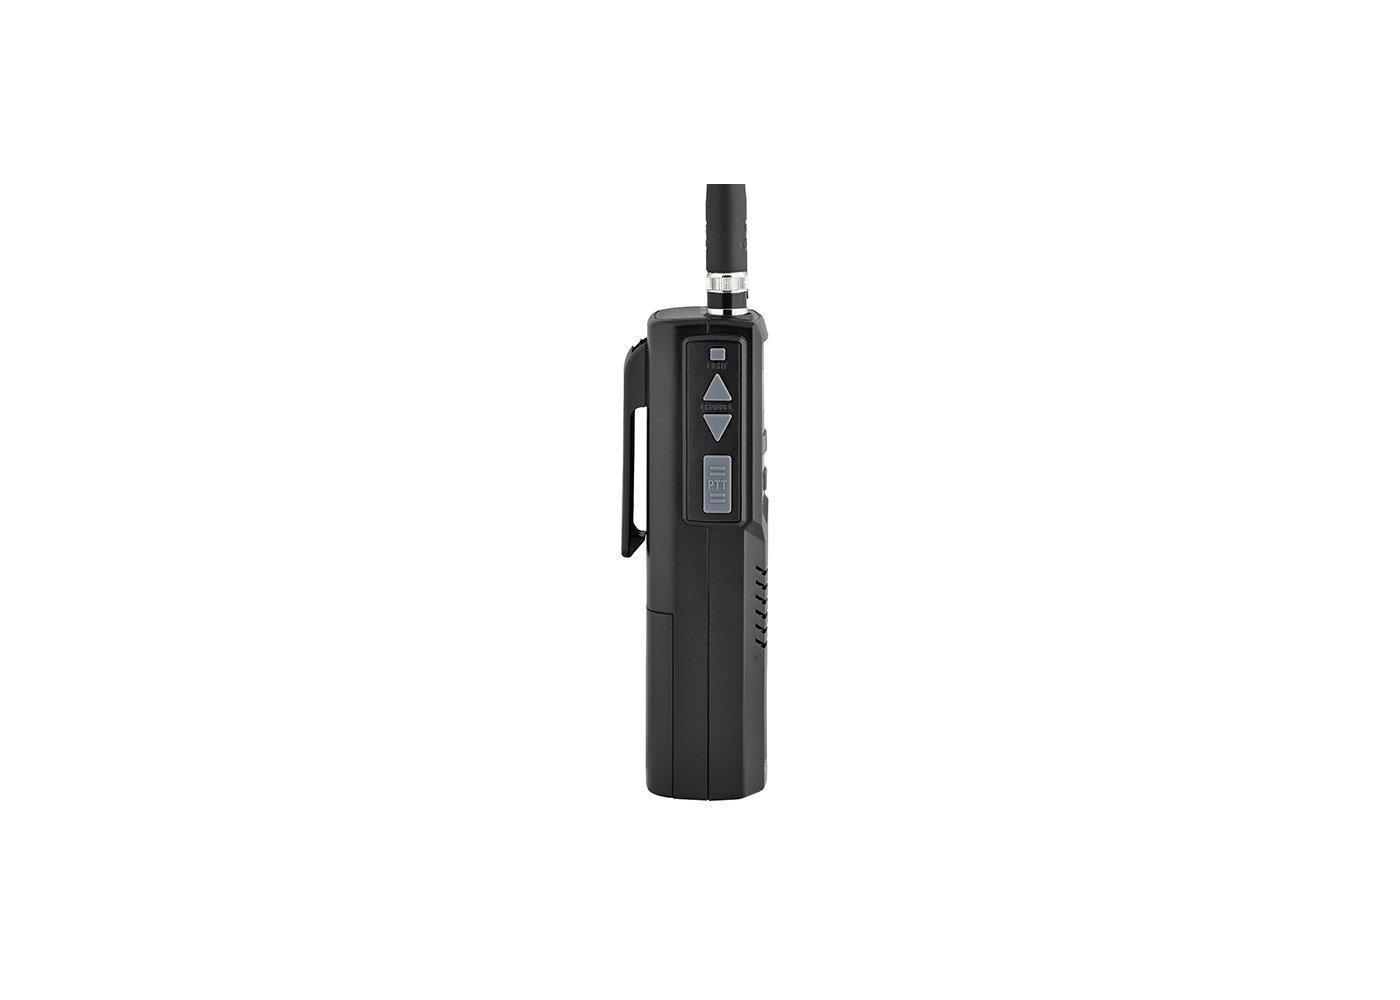 HH50WXST - Cobra® Handheld CB Radio with Weather